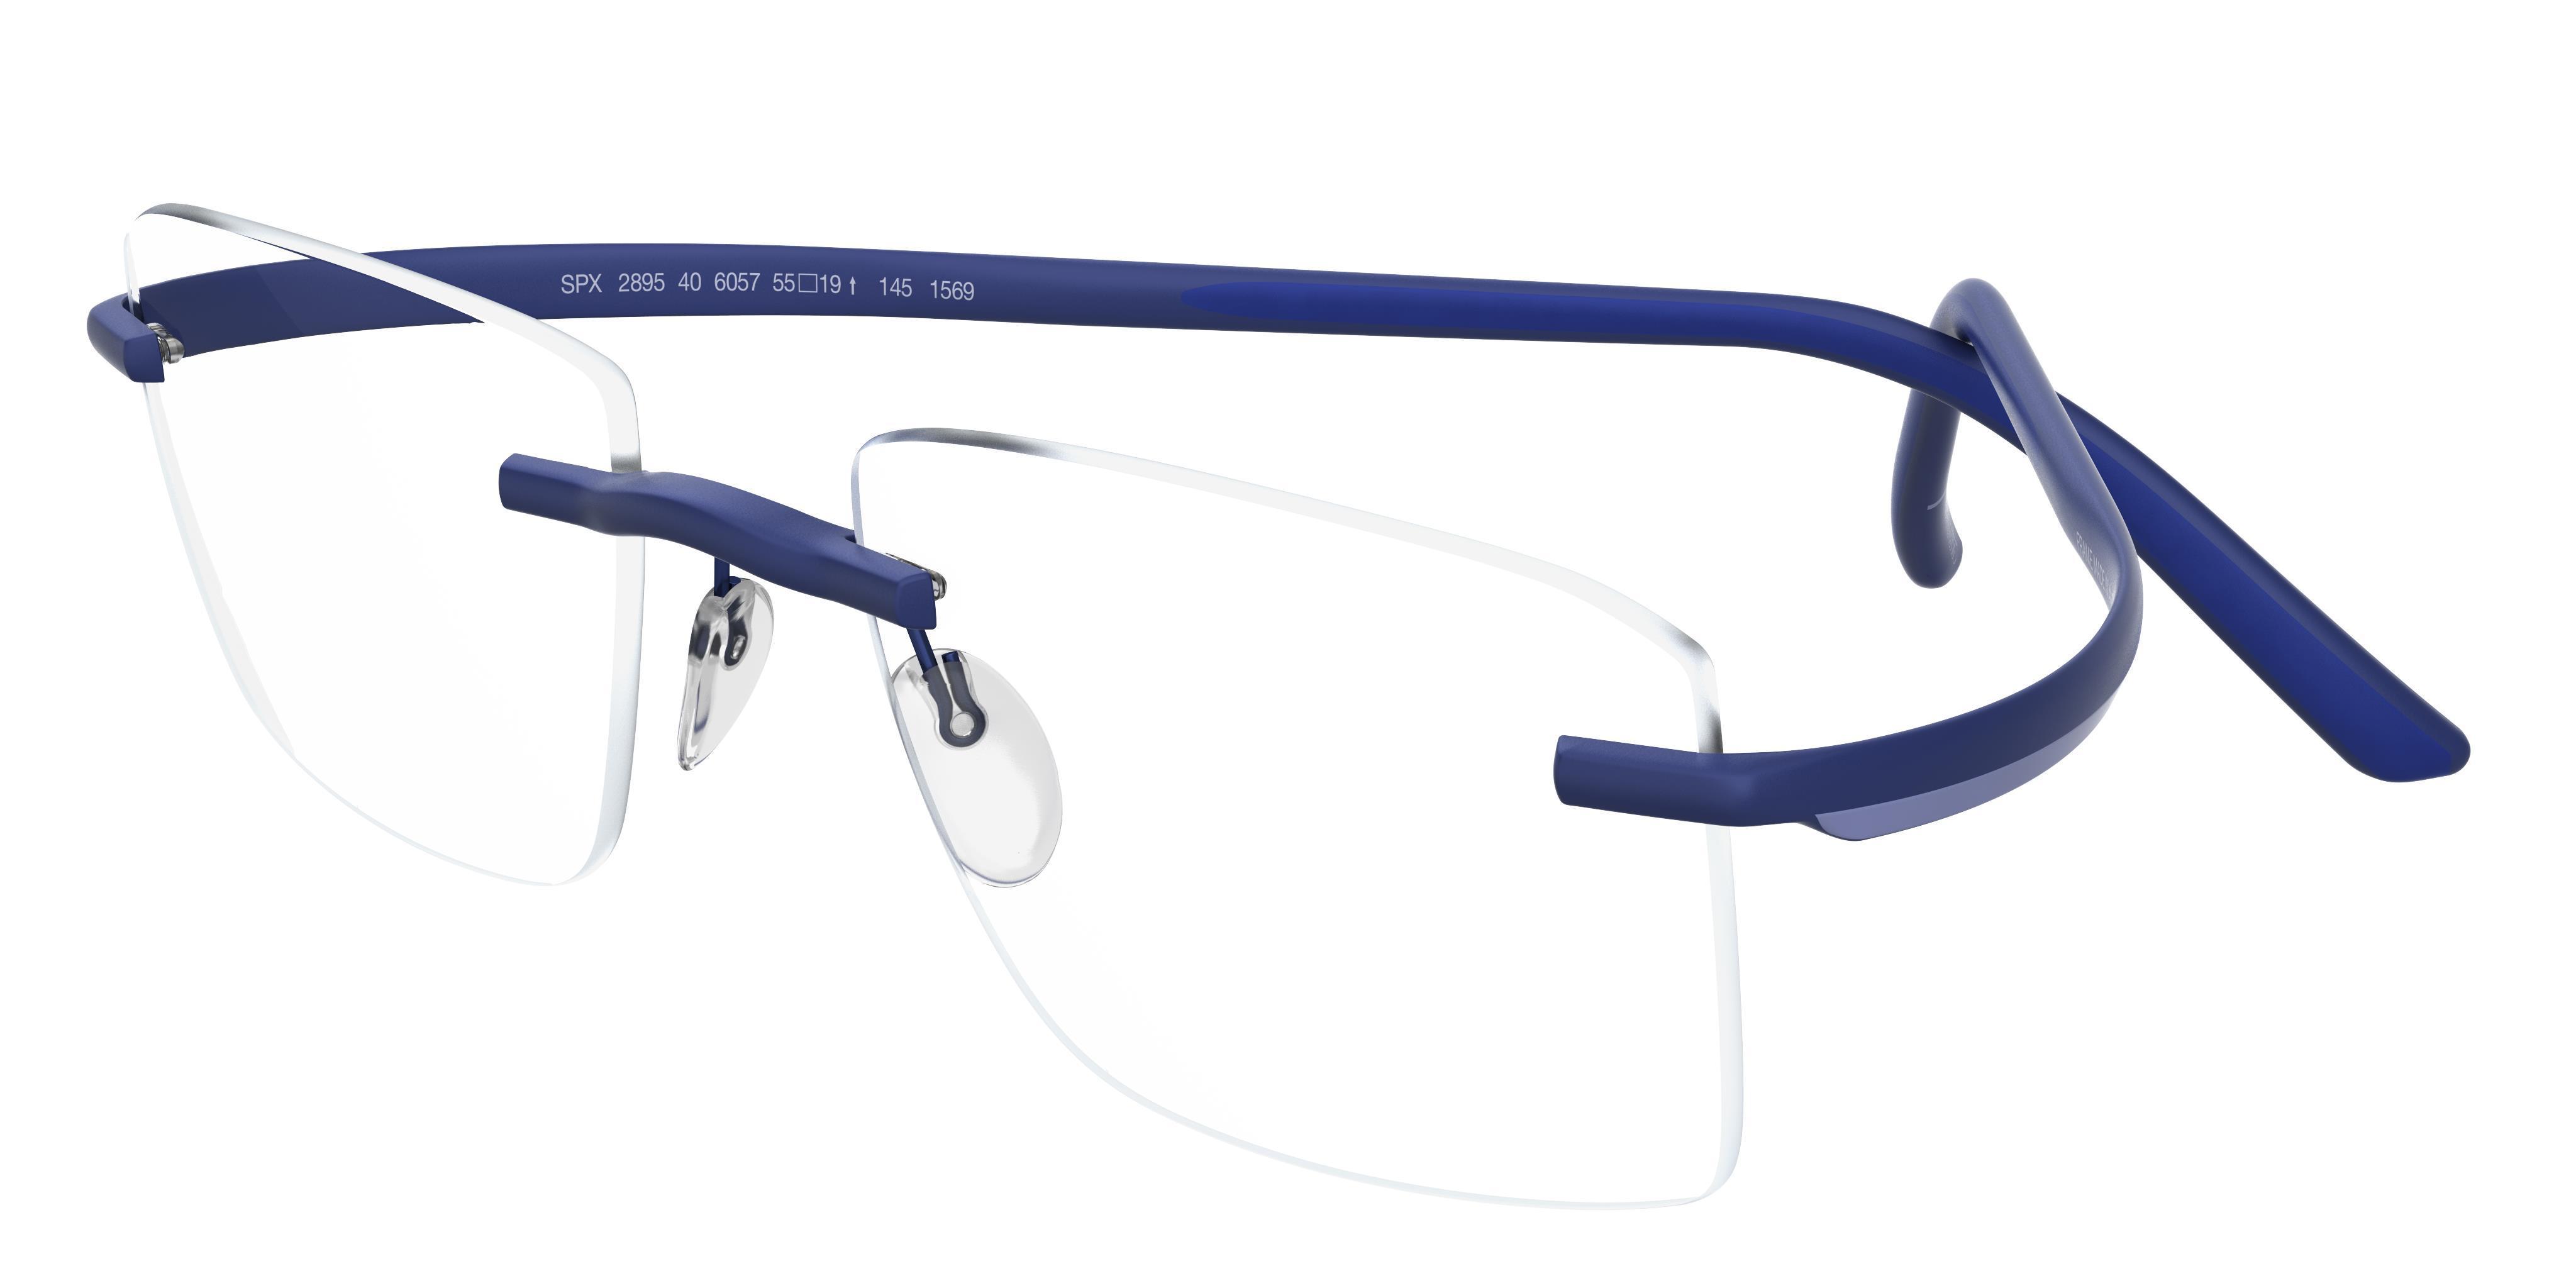 Porsche Design Glasses Online  SmartBuyGlasses South Africa